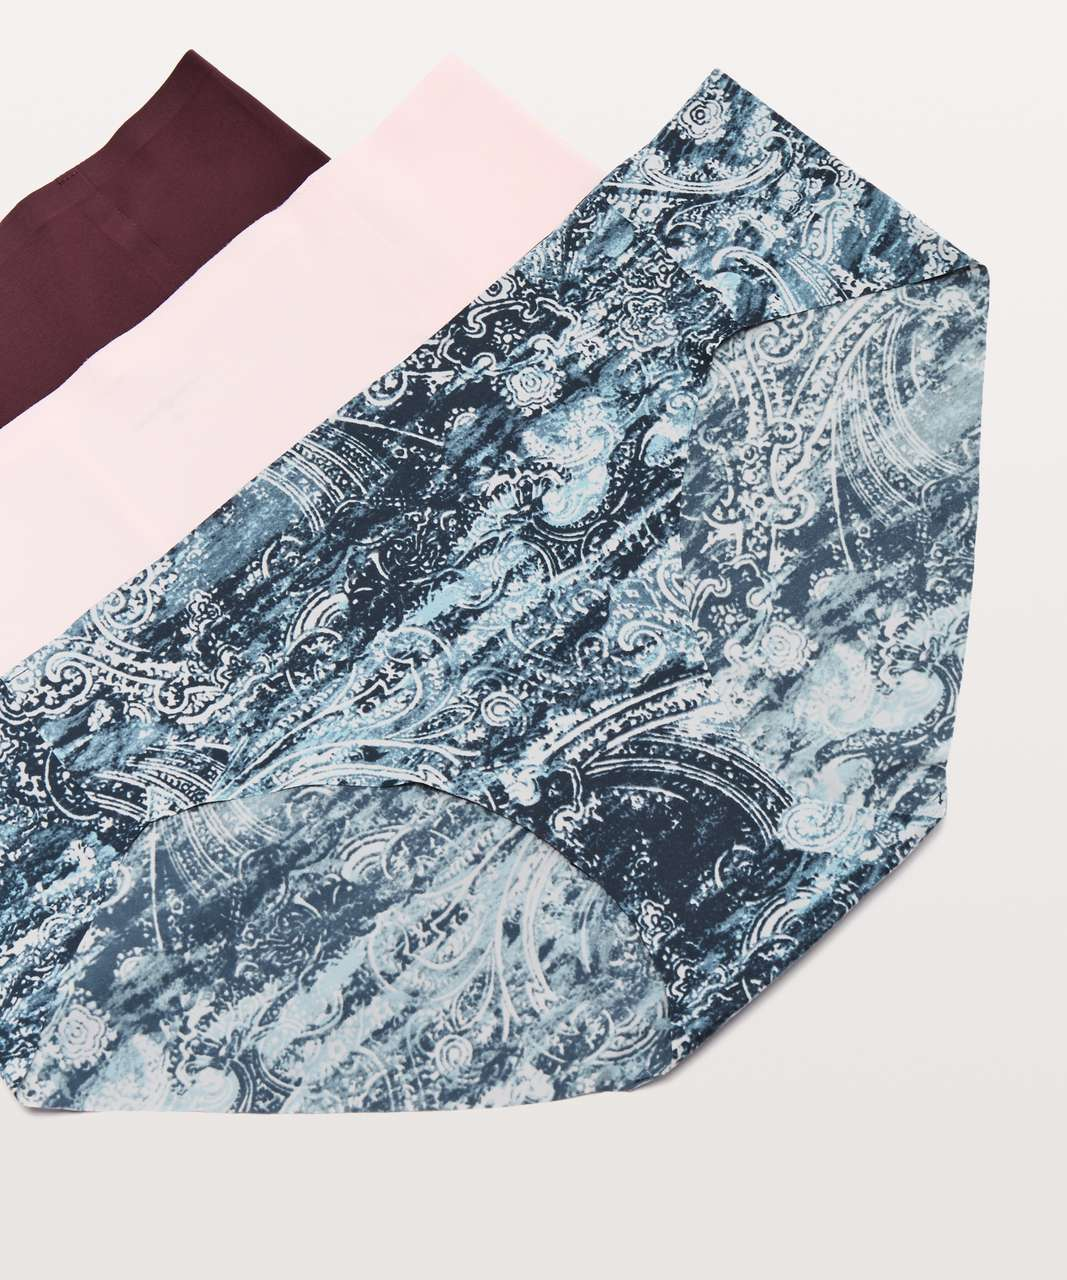 Lululemon Namastay Put Hipster 3 Pack - Dark Adobe / Paisley Glaze Multi / Blissful Pink